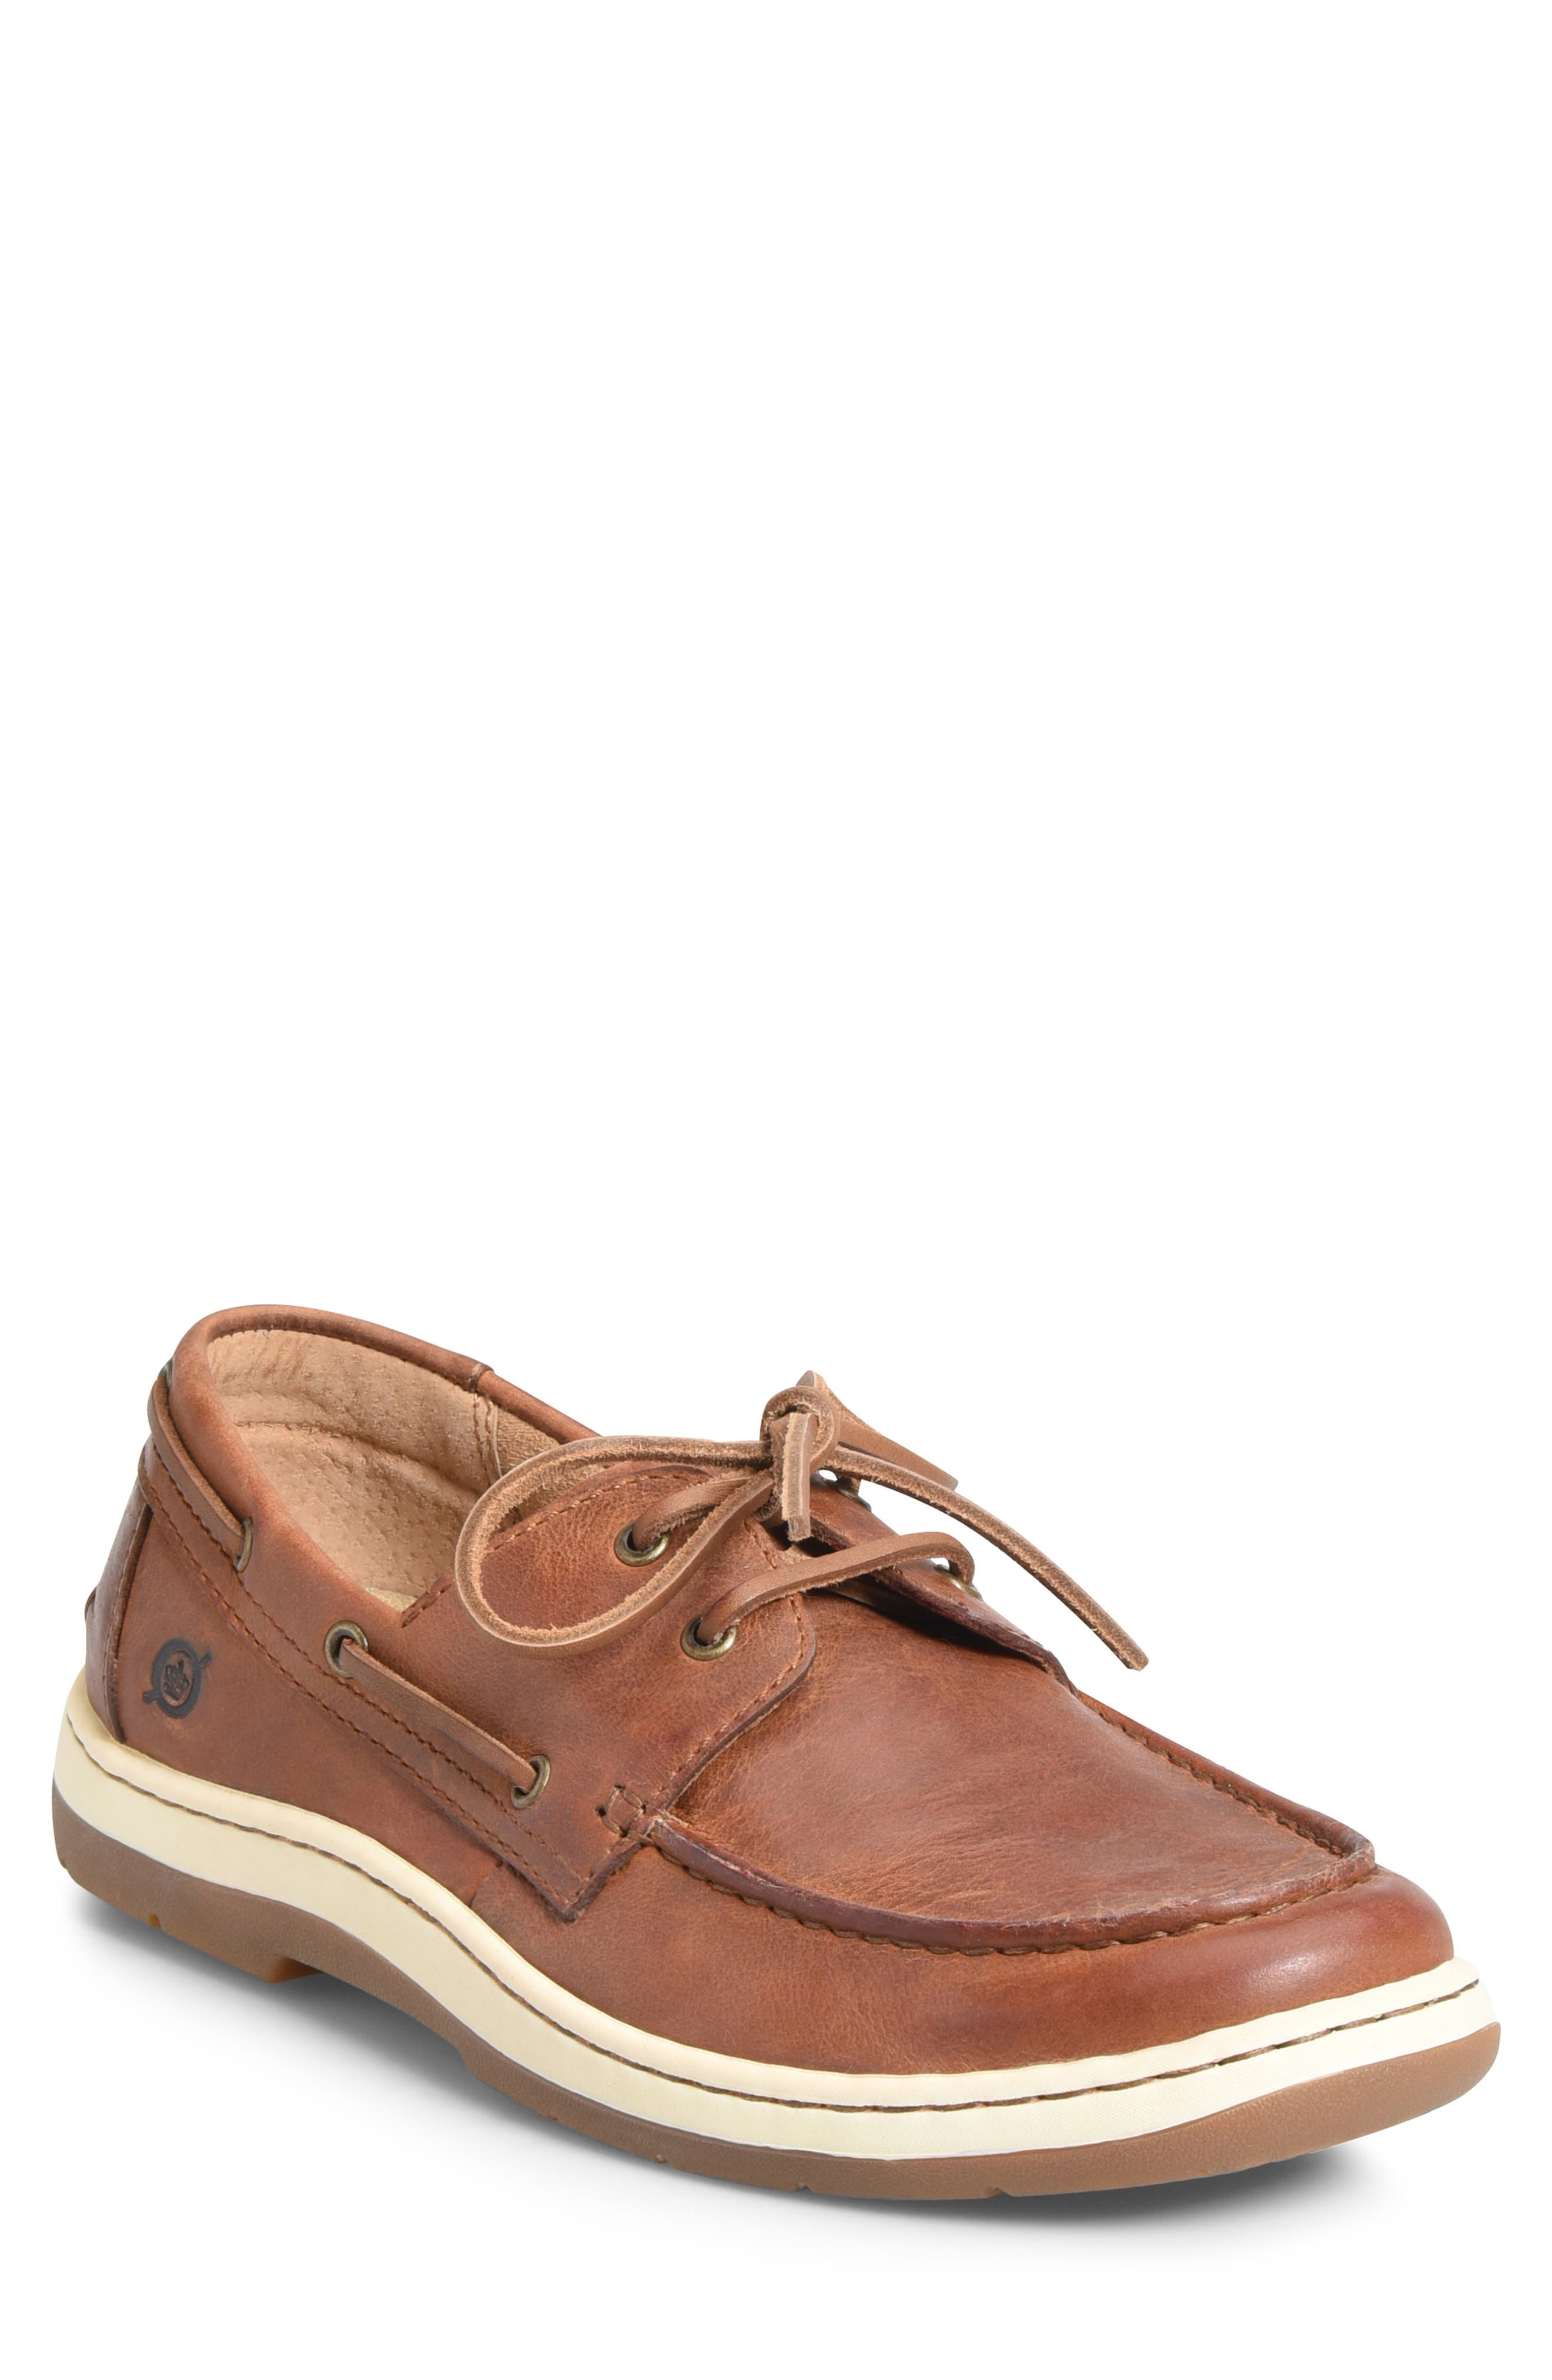 BØRN Ocean Boat Shoe, Main, color, TAN LEATHER